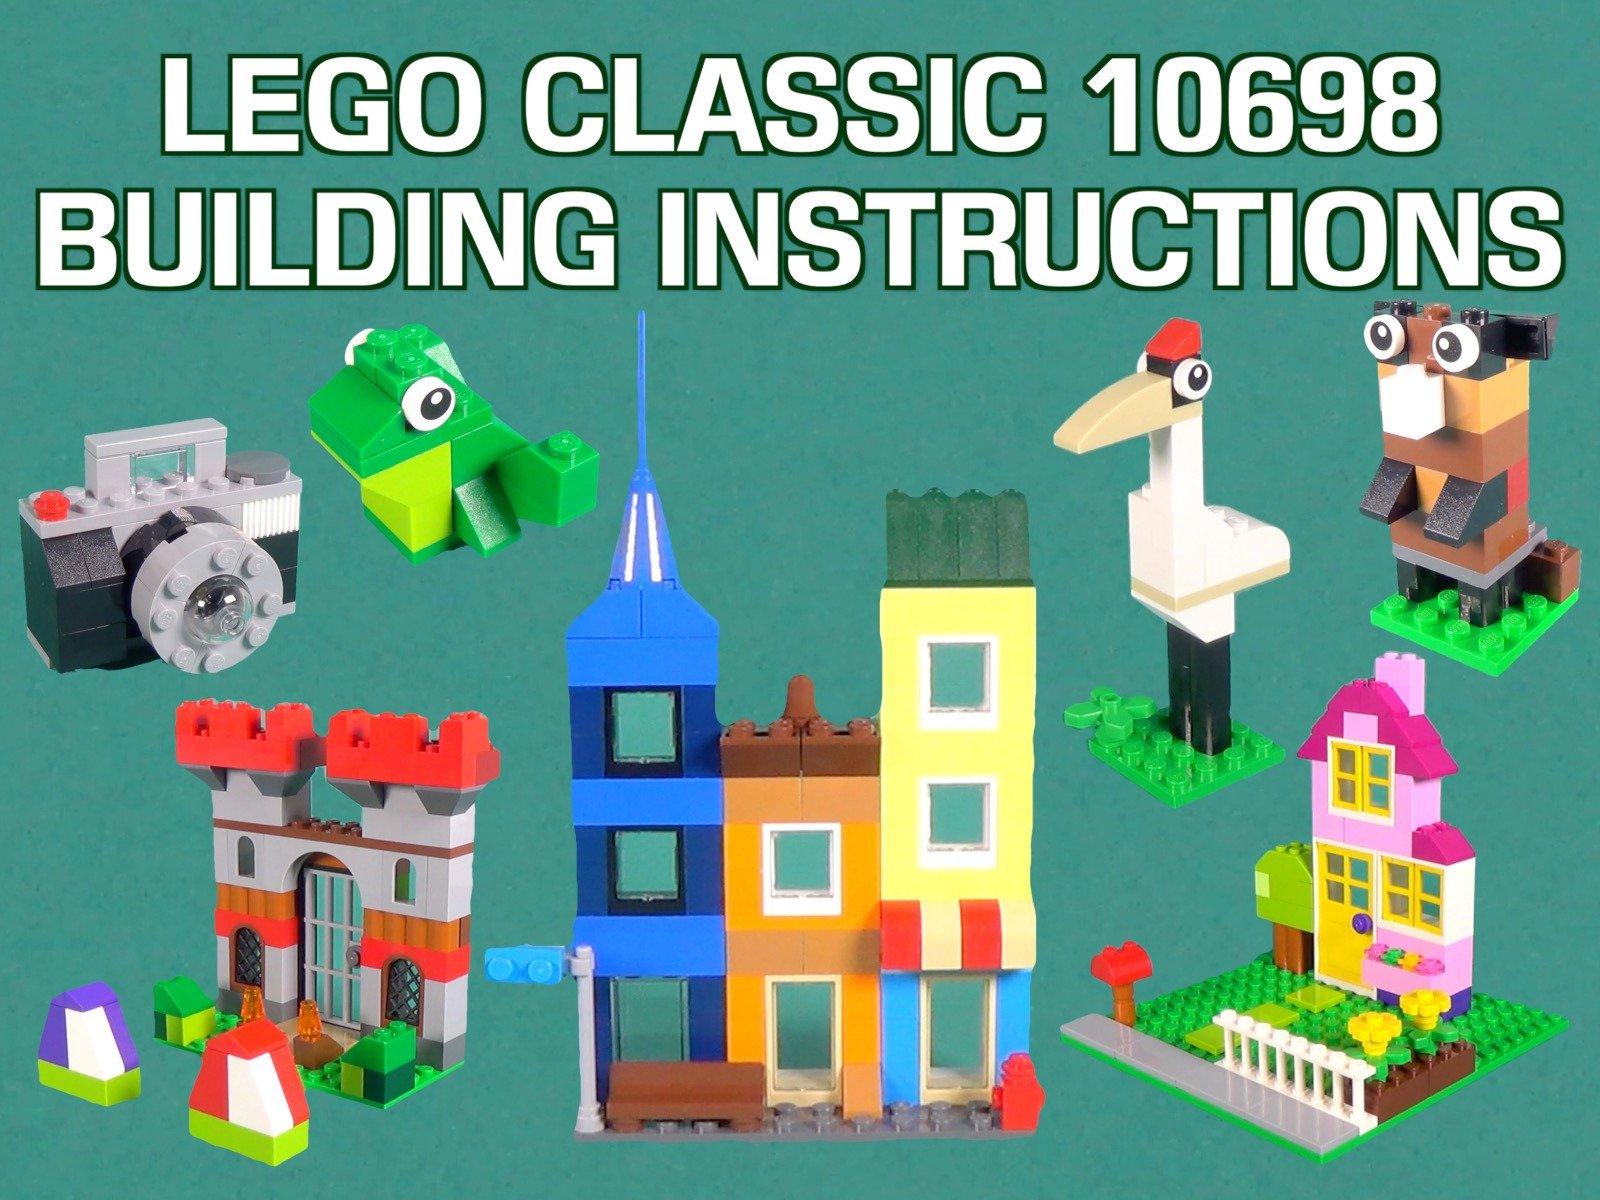 Amazon com: Watch LEGO Classic 10698 Building Instructions